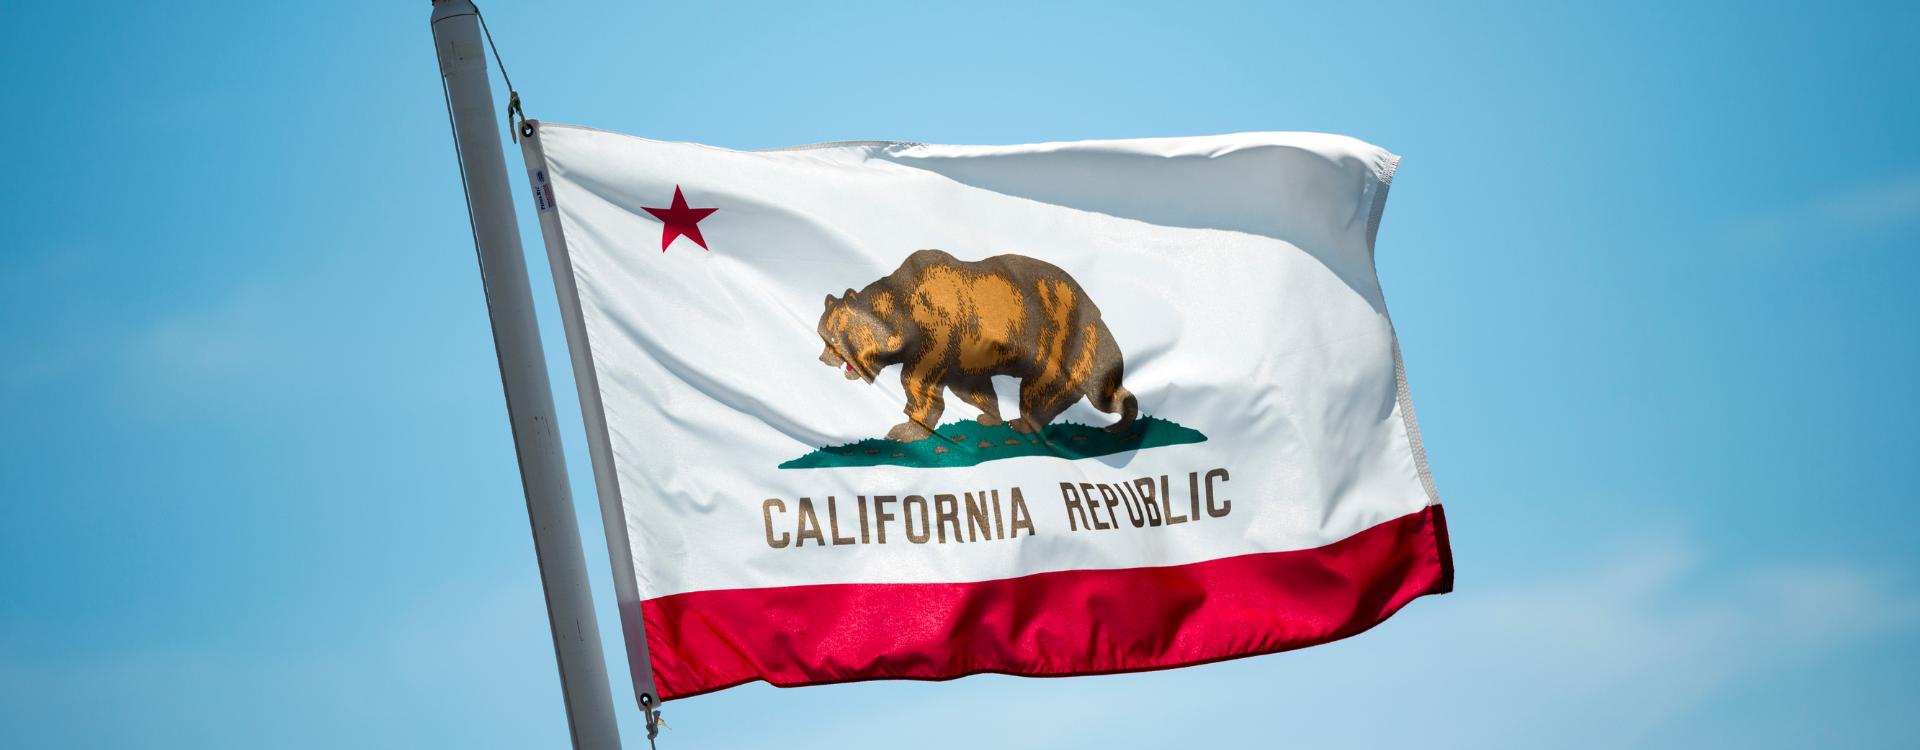 California Update: Meetings up to 5k beginning June 15